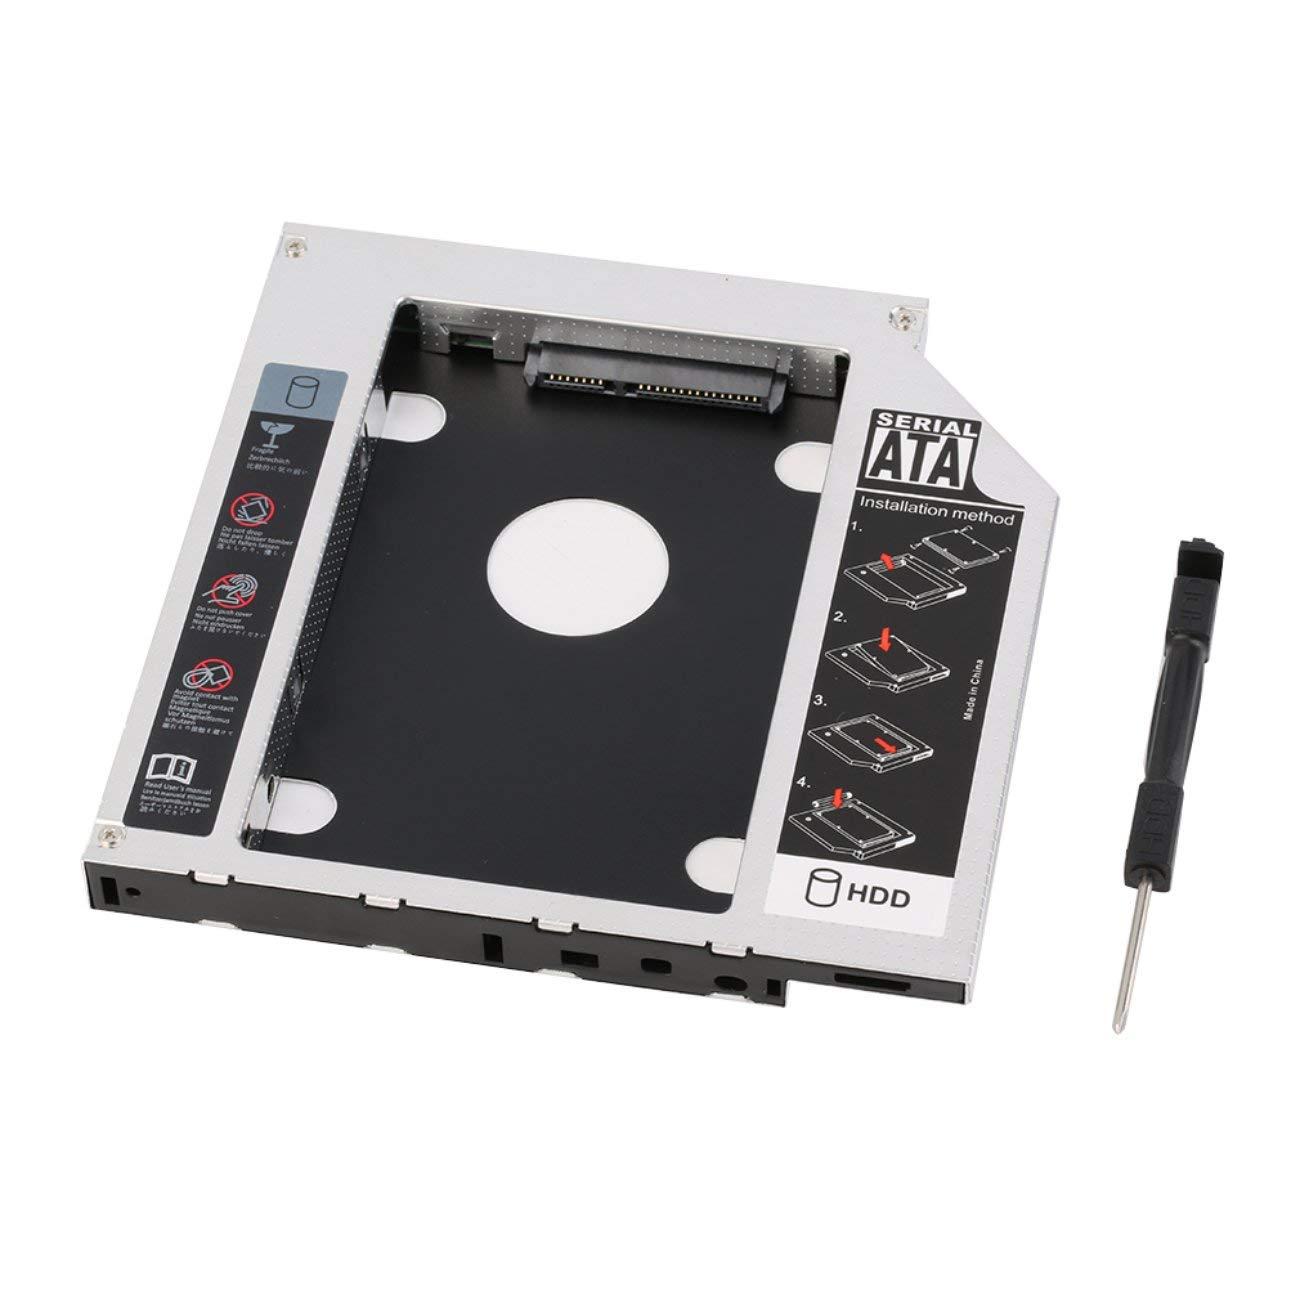 Universal 12.7mm SATA 2nd SSD Unidad de Disco Duro HDD o DVD-ROM ...